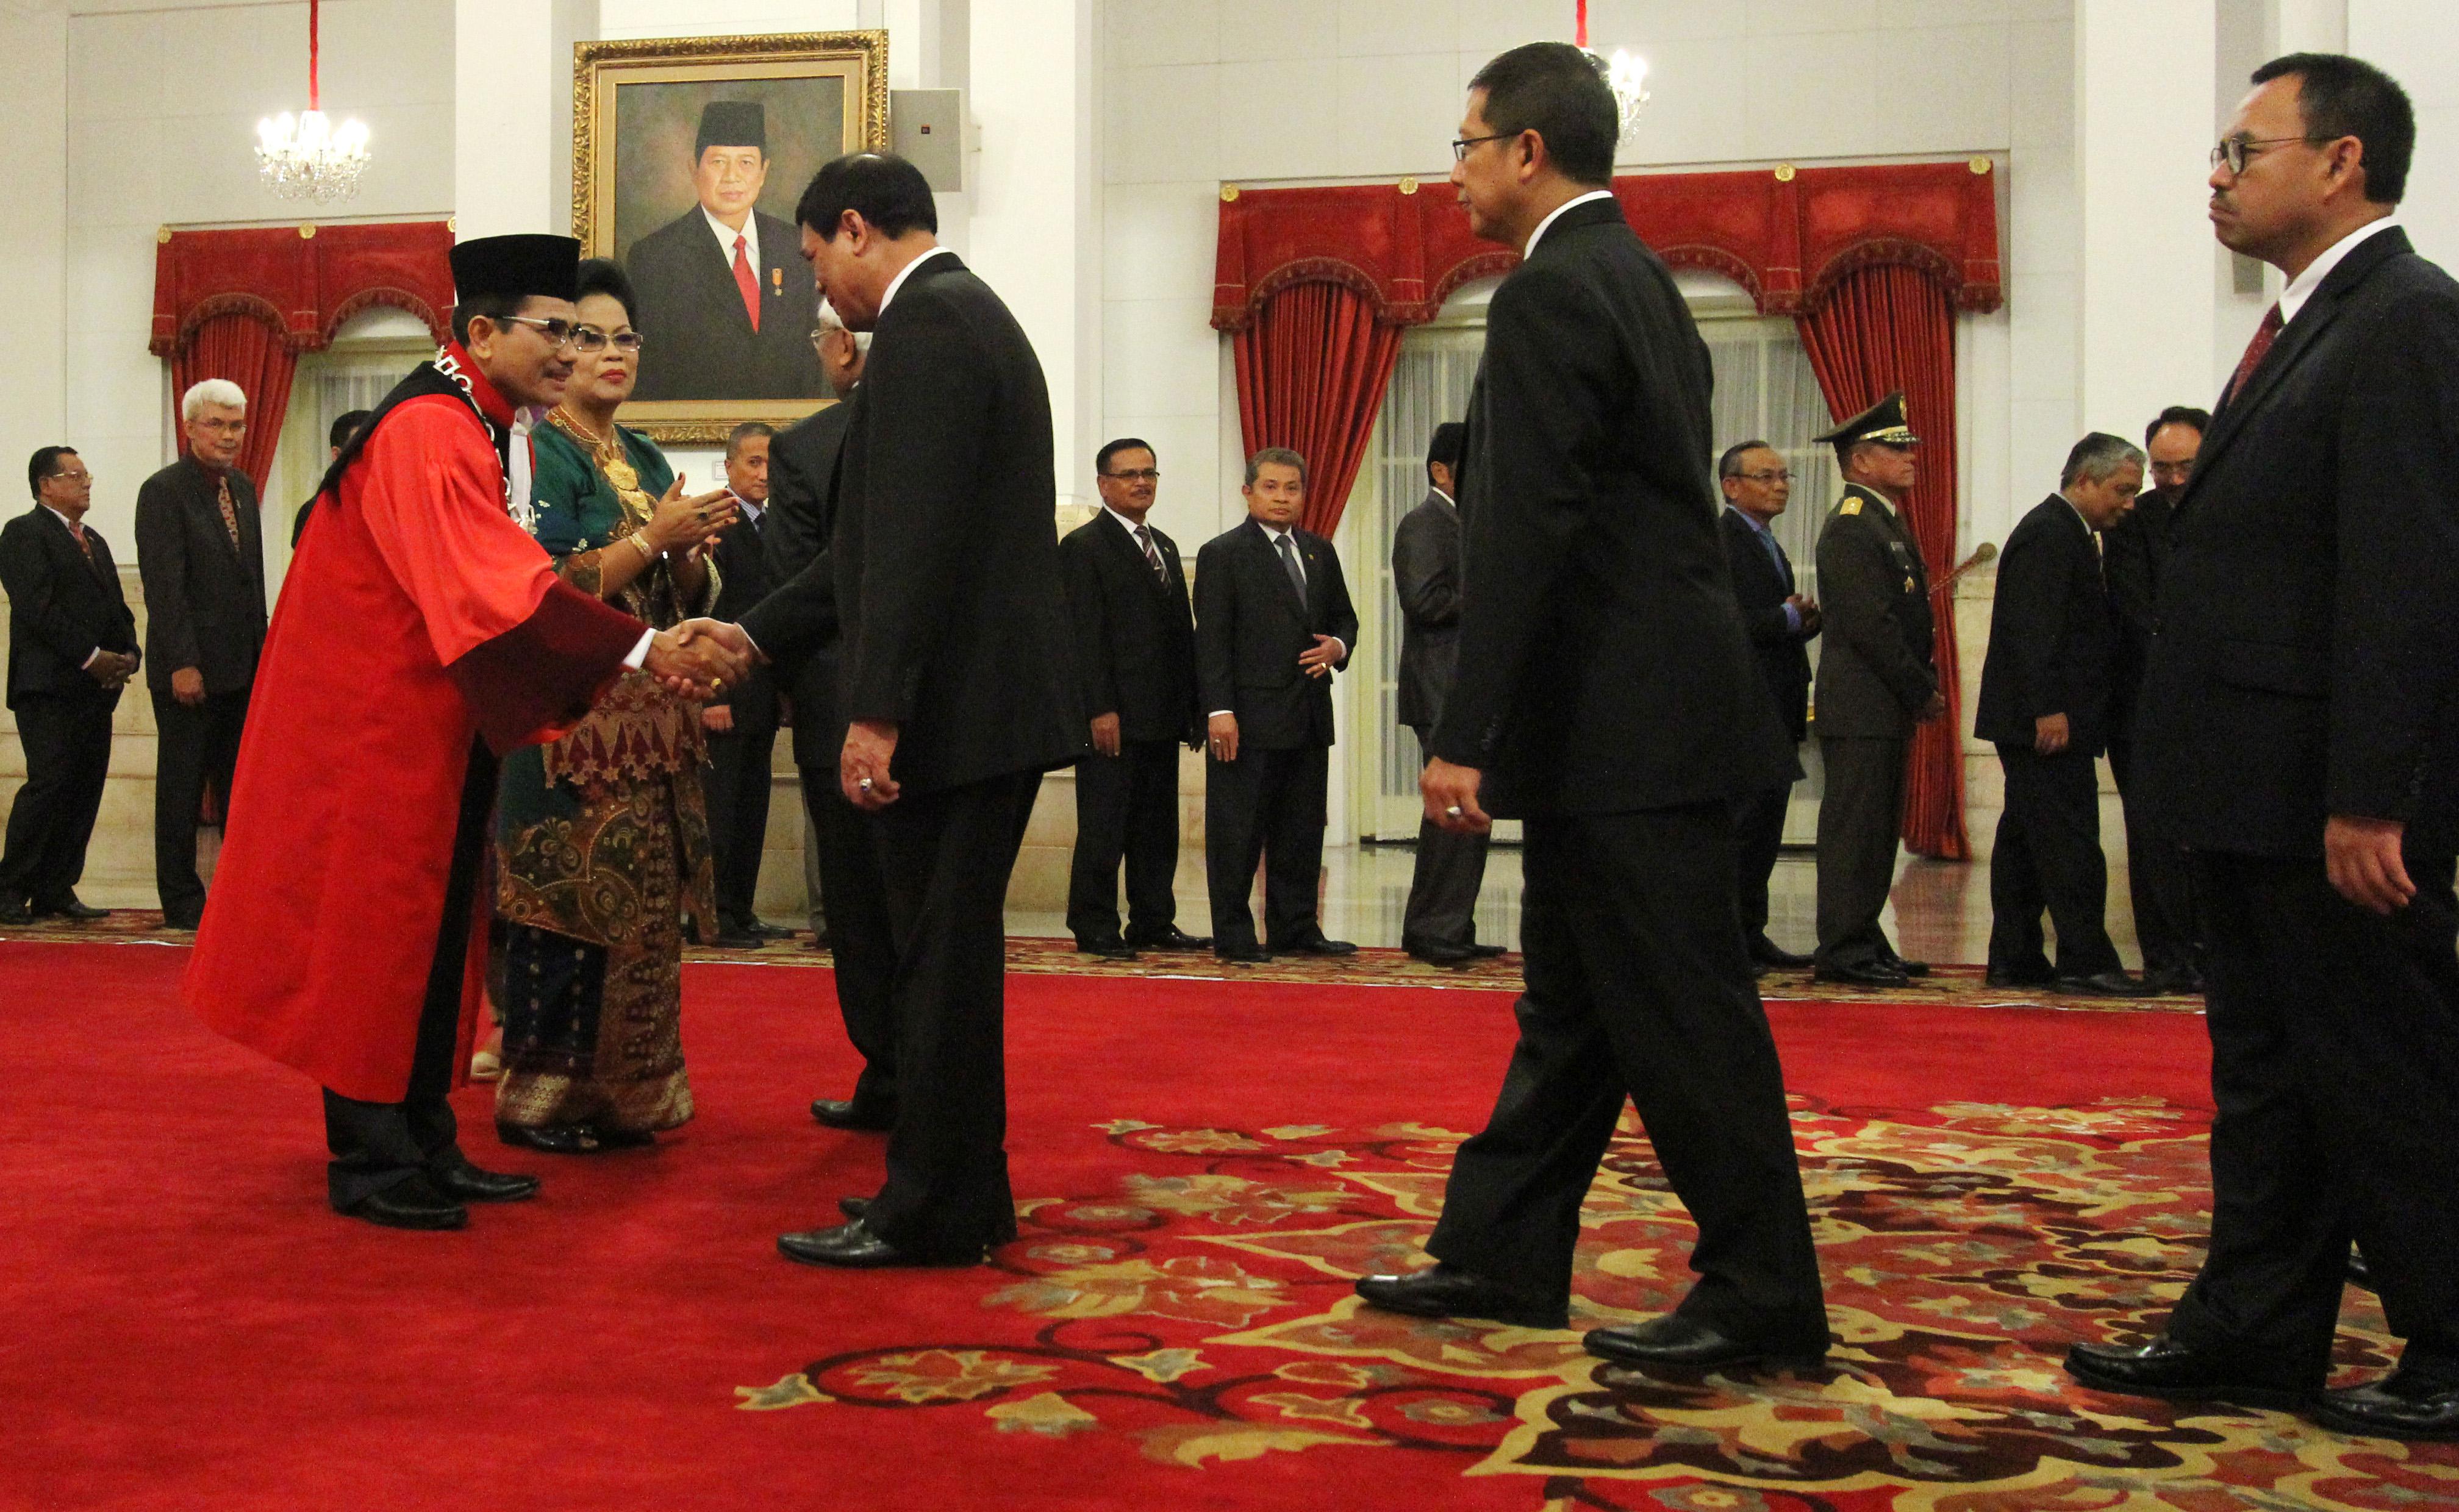 Sejumlah Menteri Kabinet Kerja Memberikan Ucapan Selamat kepada Ketua Hakim Konstitusi Manahan Sitompul